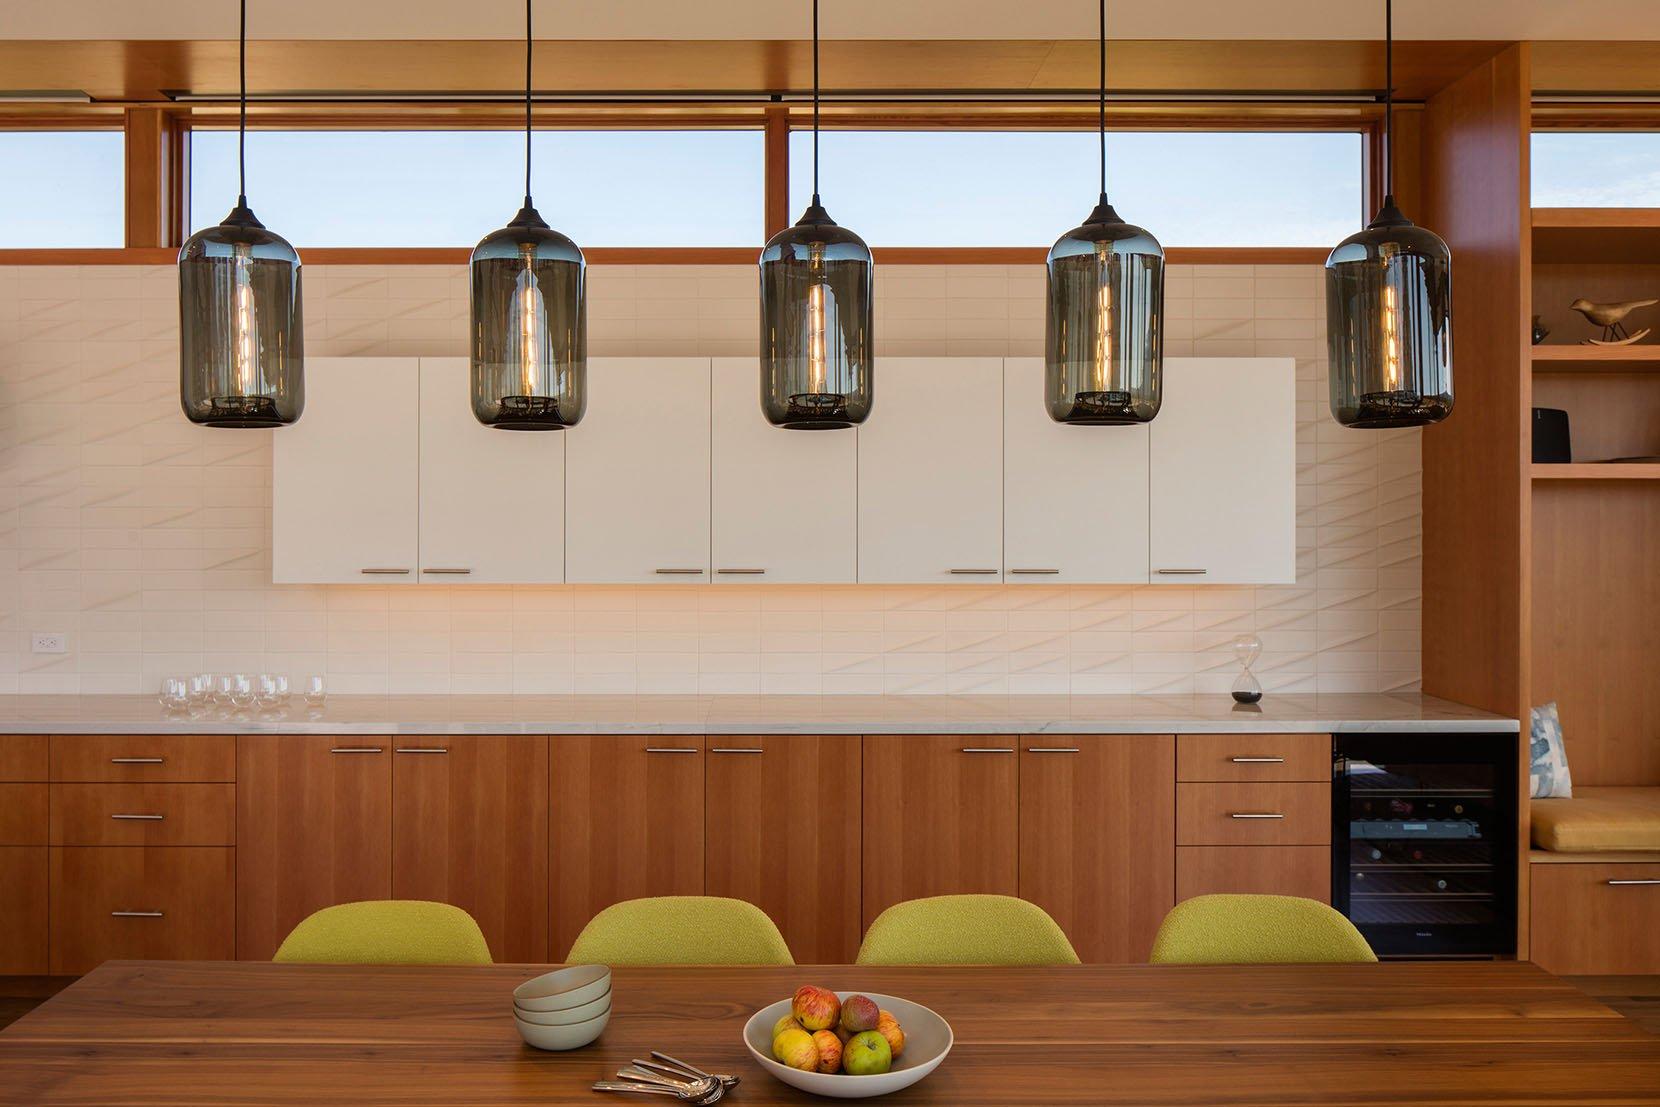 https://www.nichemodern.com/hs-fs/hubfs/Niche_COS/Pages/Modern_Lighting_Projects/Dining-Room-Lighting/Modern-Dining-Room-Lighting-Project-Pages-G-Ellen-Home-Gray-Pods.jpg?t=1532050848376&width=1660&name=Modern-Dining-Room-Lighting-Project-Pages-G-Ellen-Home-Gray-Pods.jpg